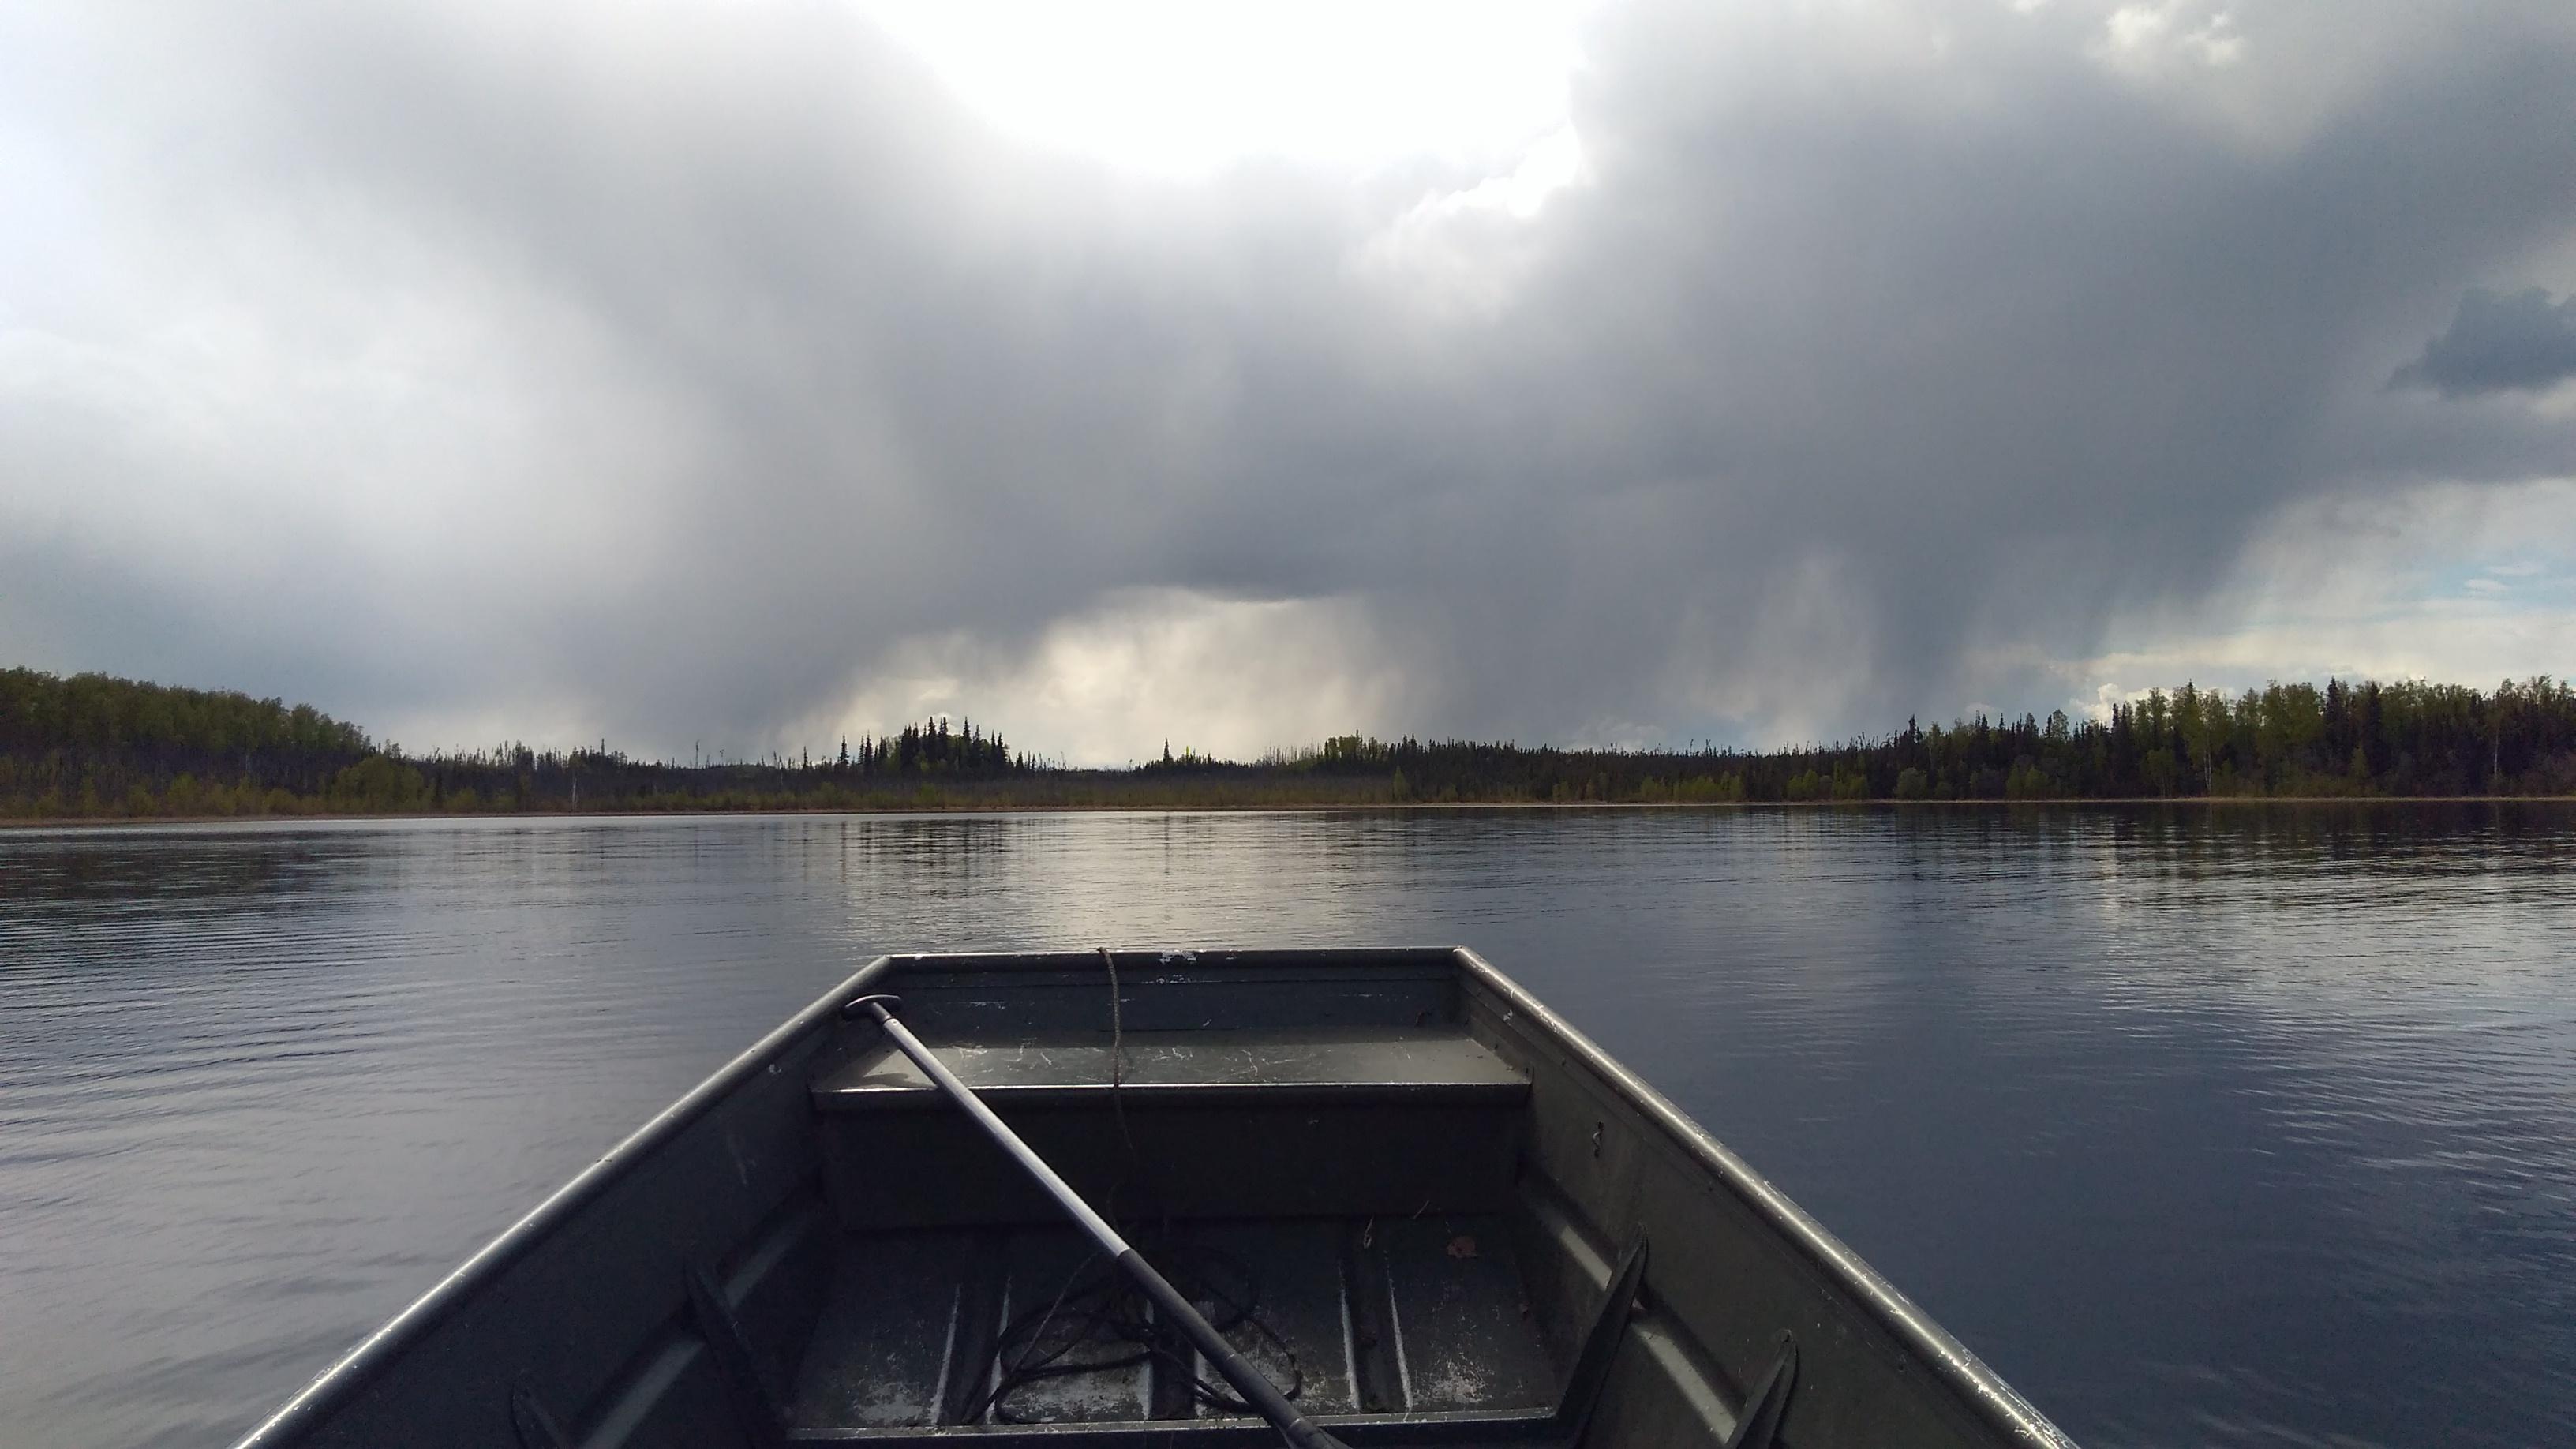 Rain in the distance at Geskakmina